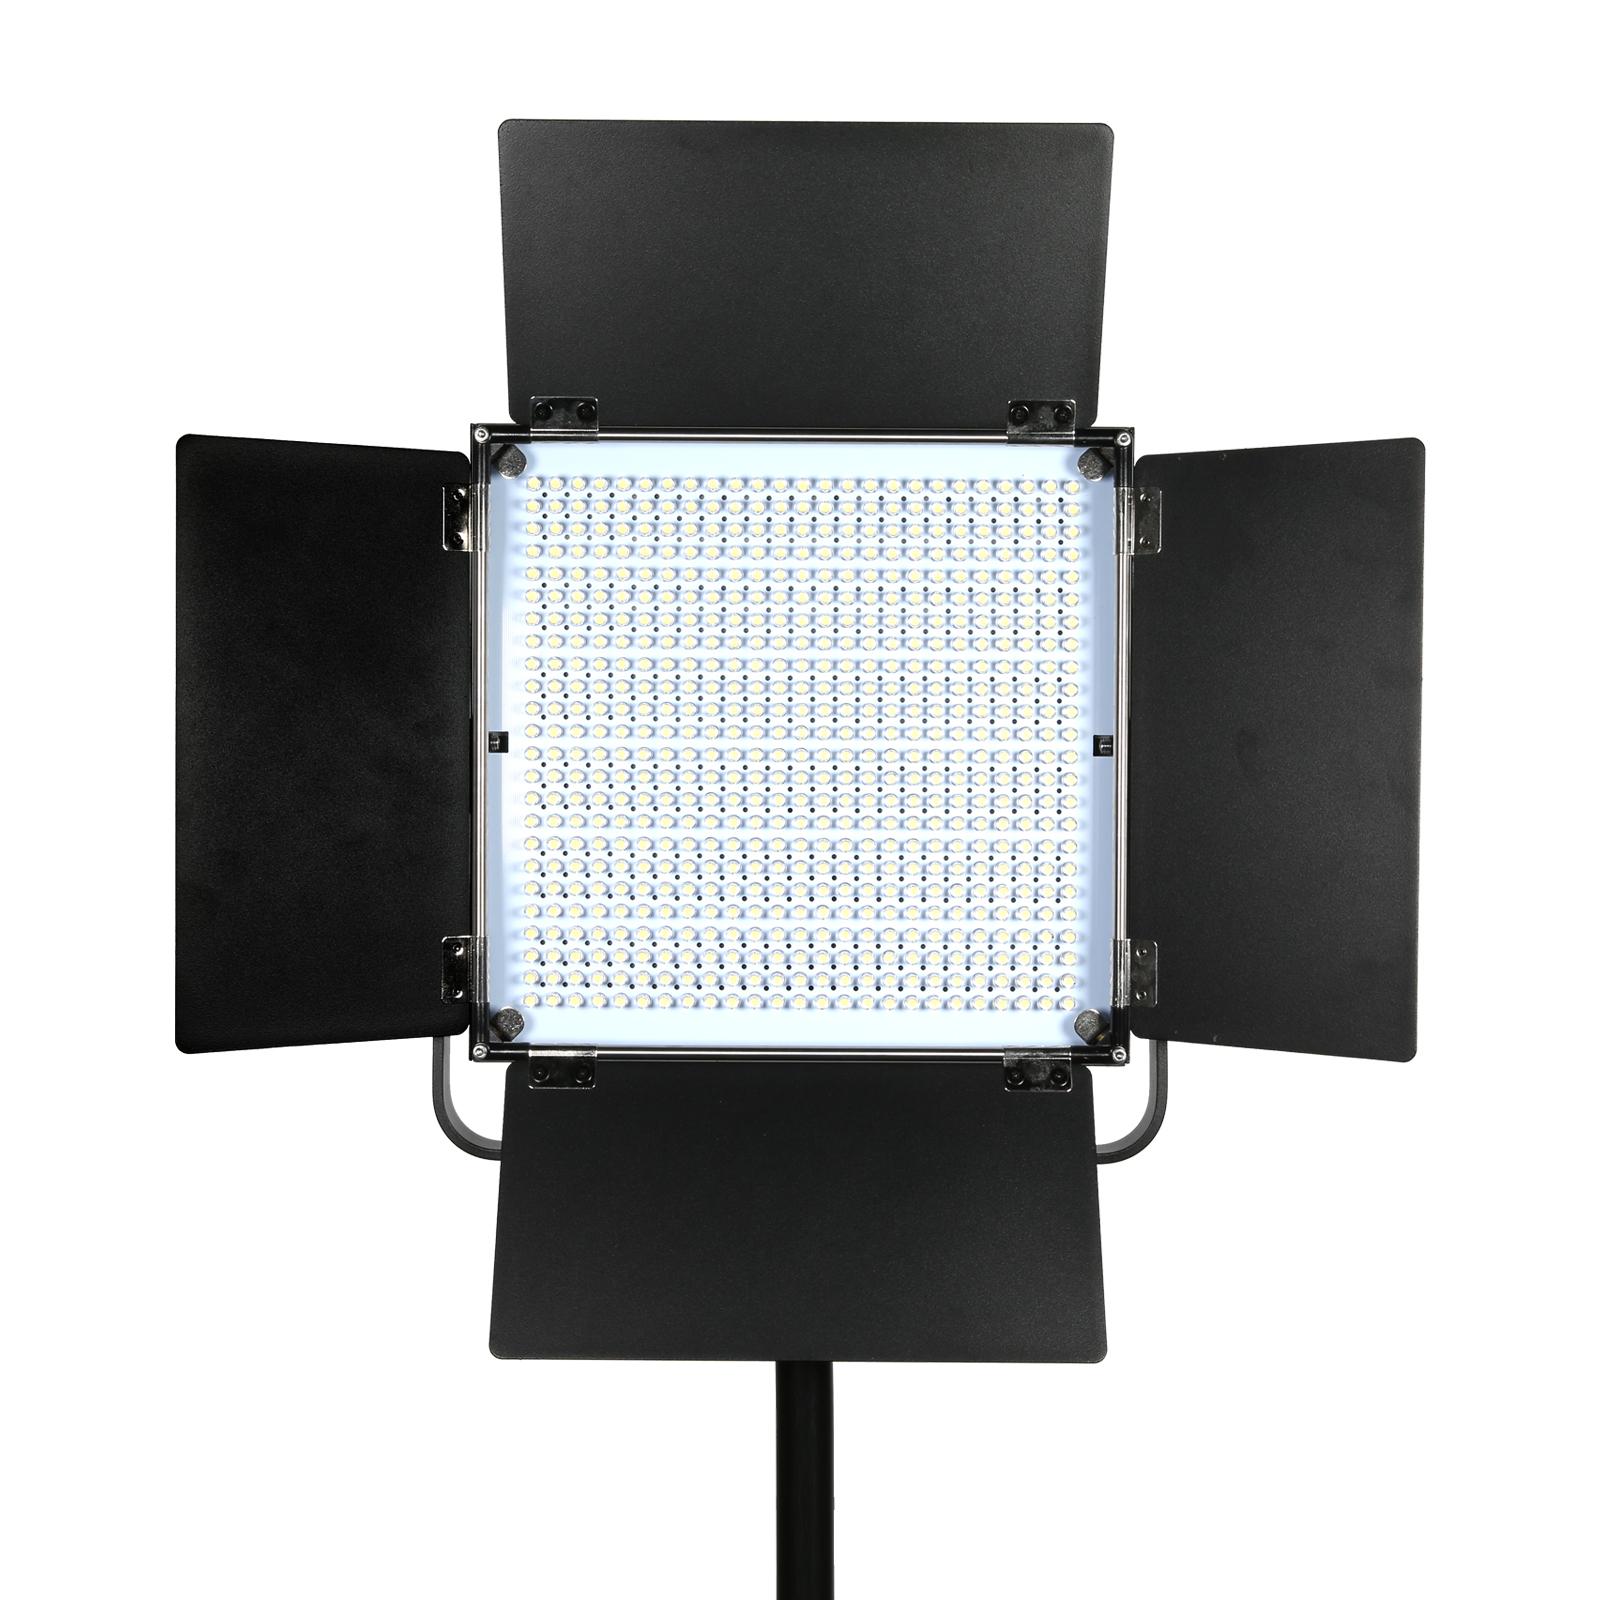 Plxel K80 RGB Metal Light, Gathering light Reflector, brightness upgrade, bi-color temperature and Stepless Adjusted.